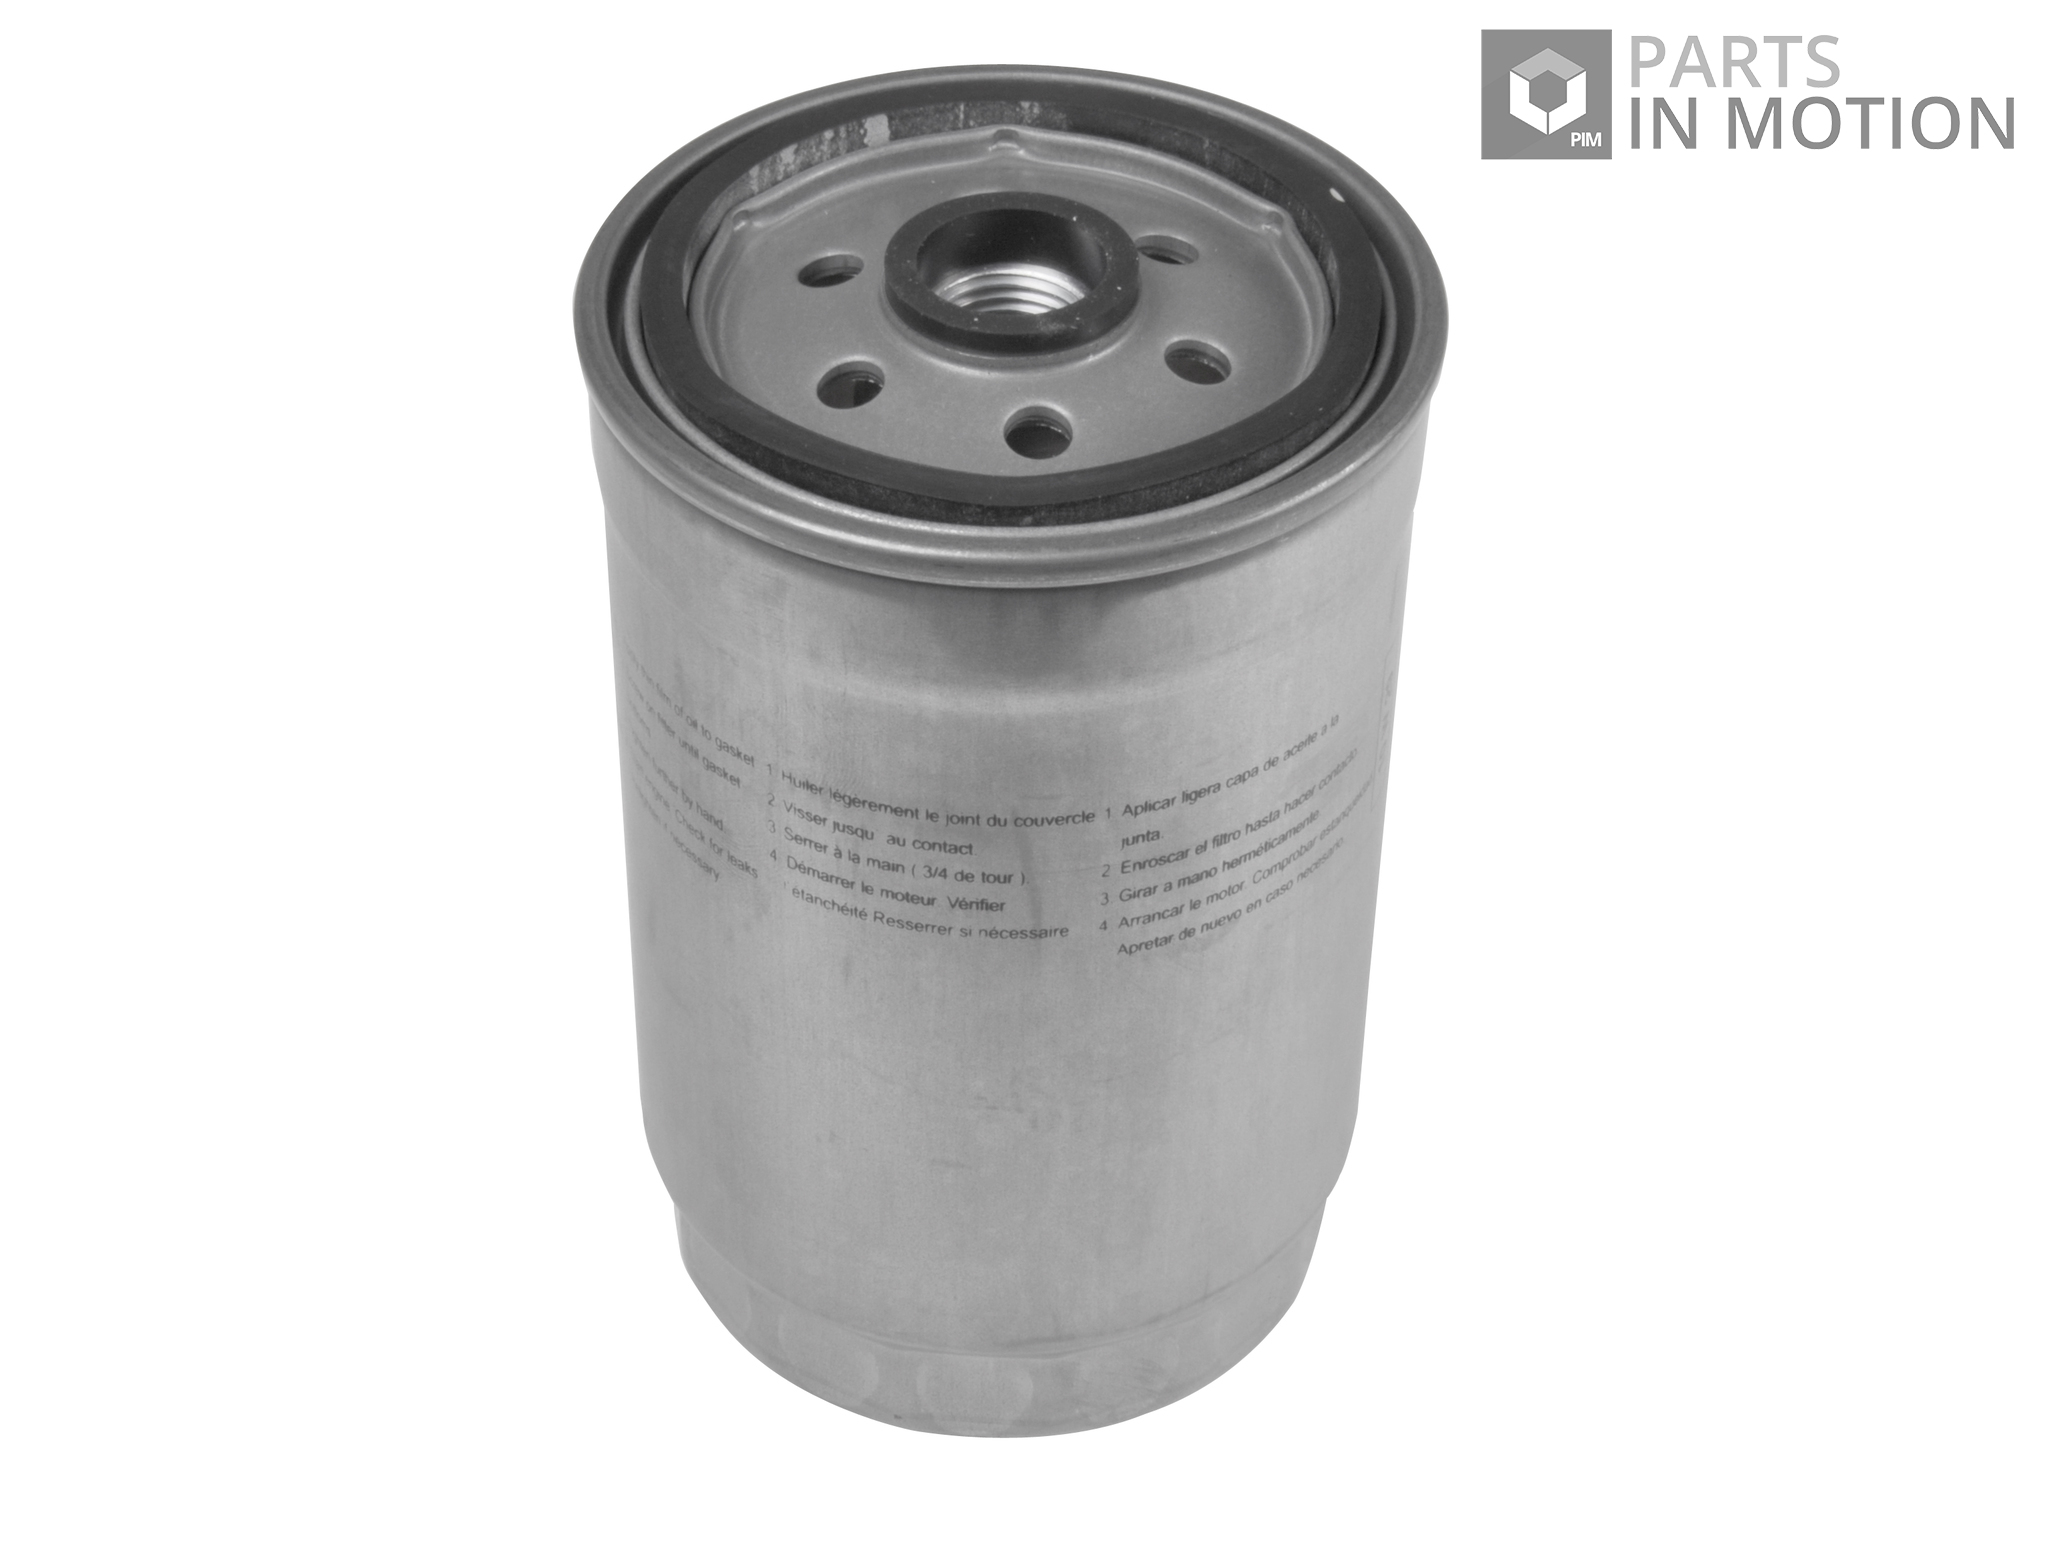 Fuel Filter Adg02333 Blue Print 319223e300 319222w000 319222b900 2011 Kia Sorento Location 2